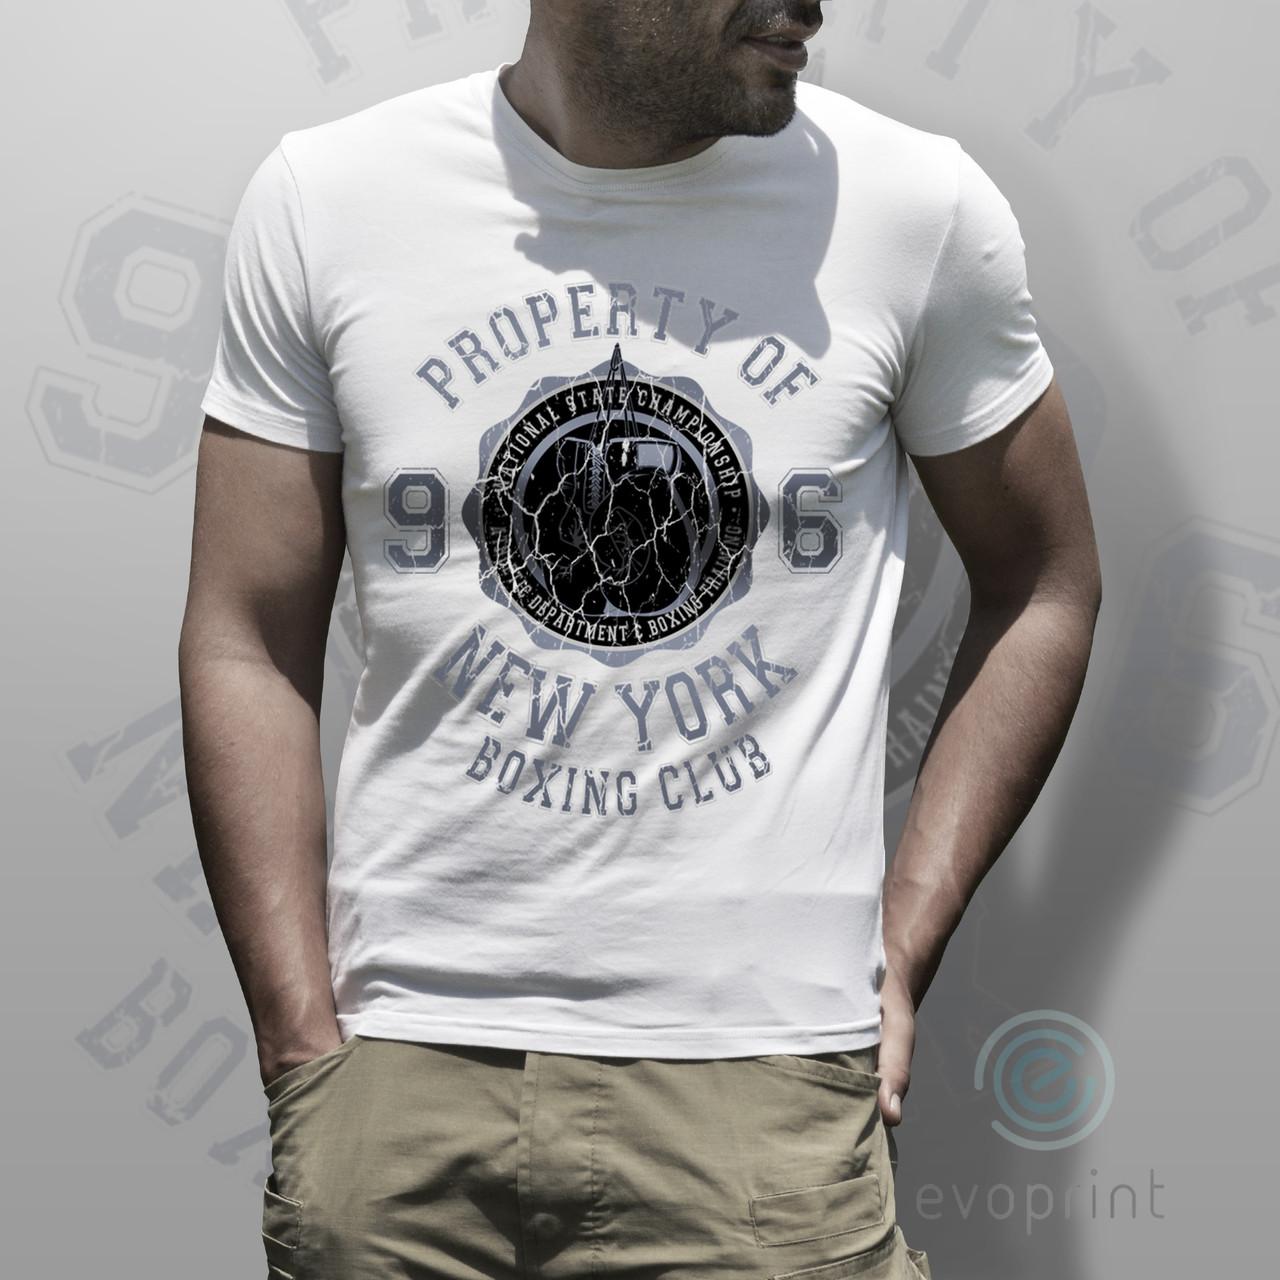 Печать логотипа спорт клубов на футболки